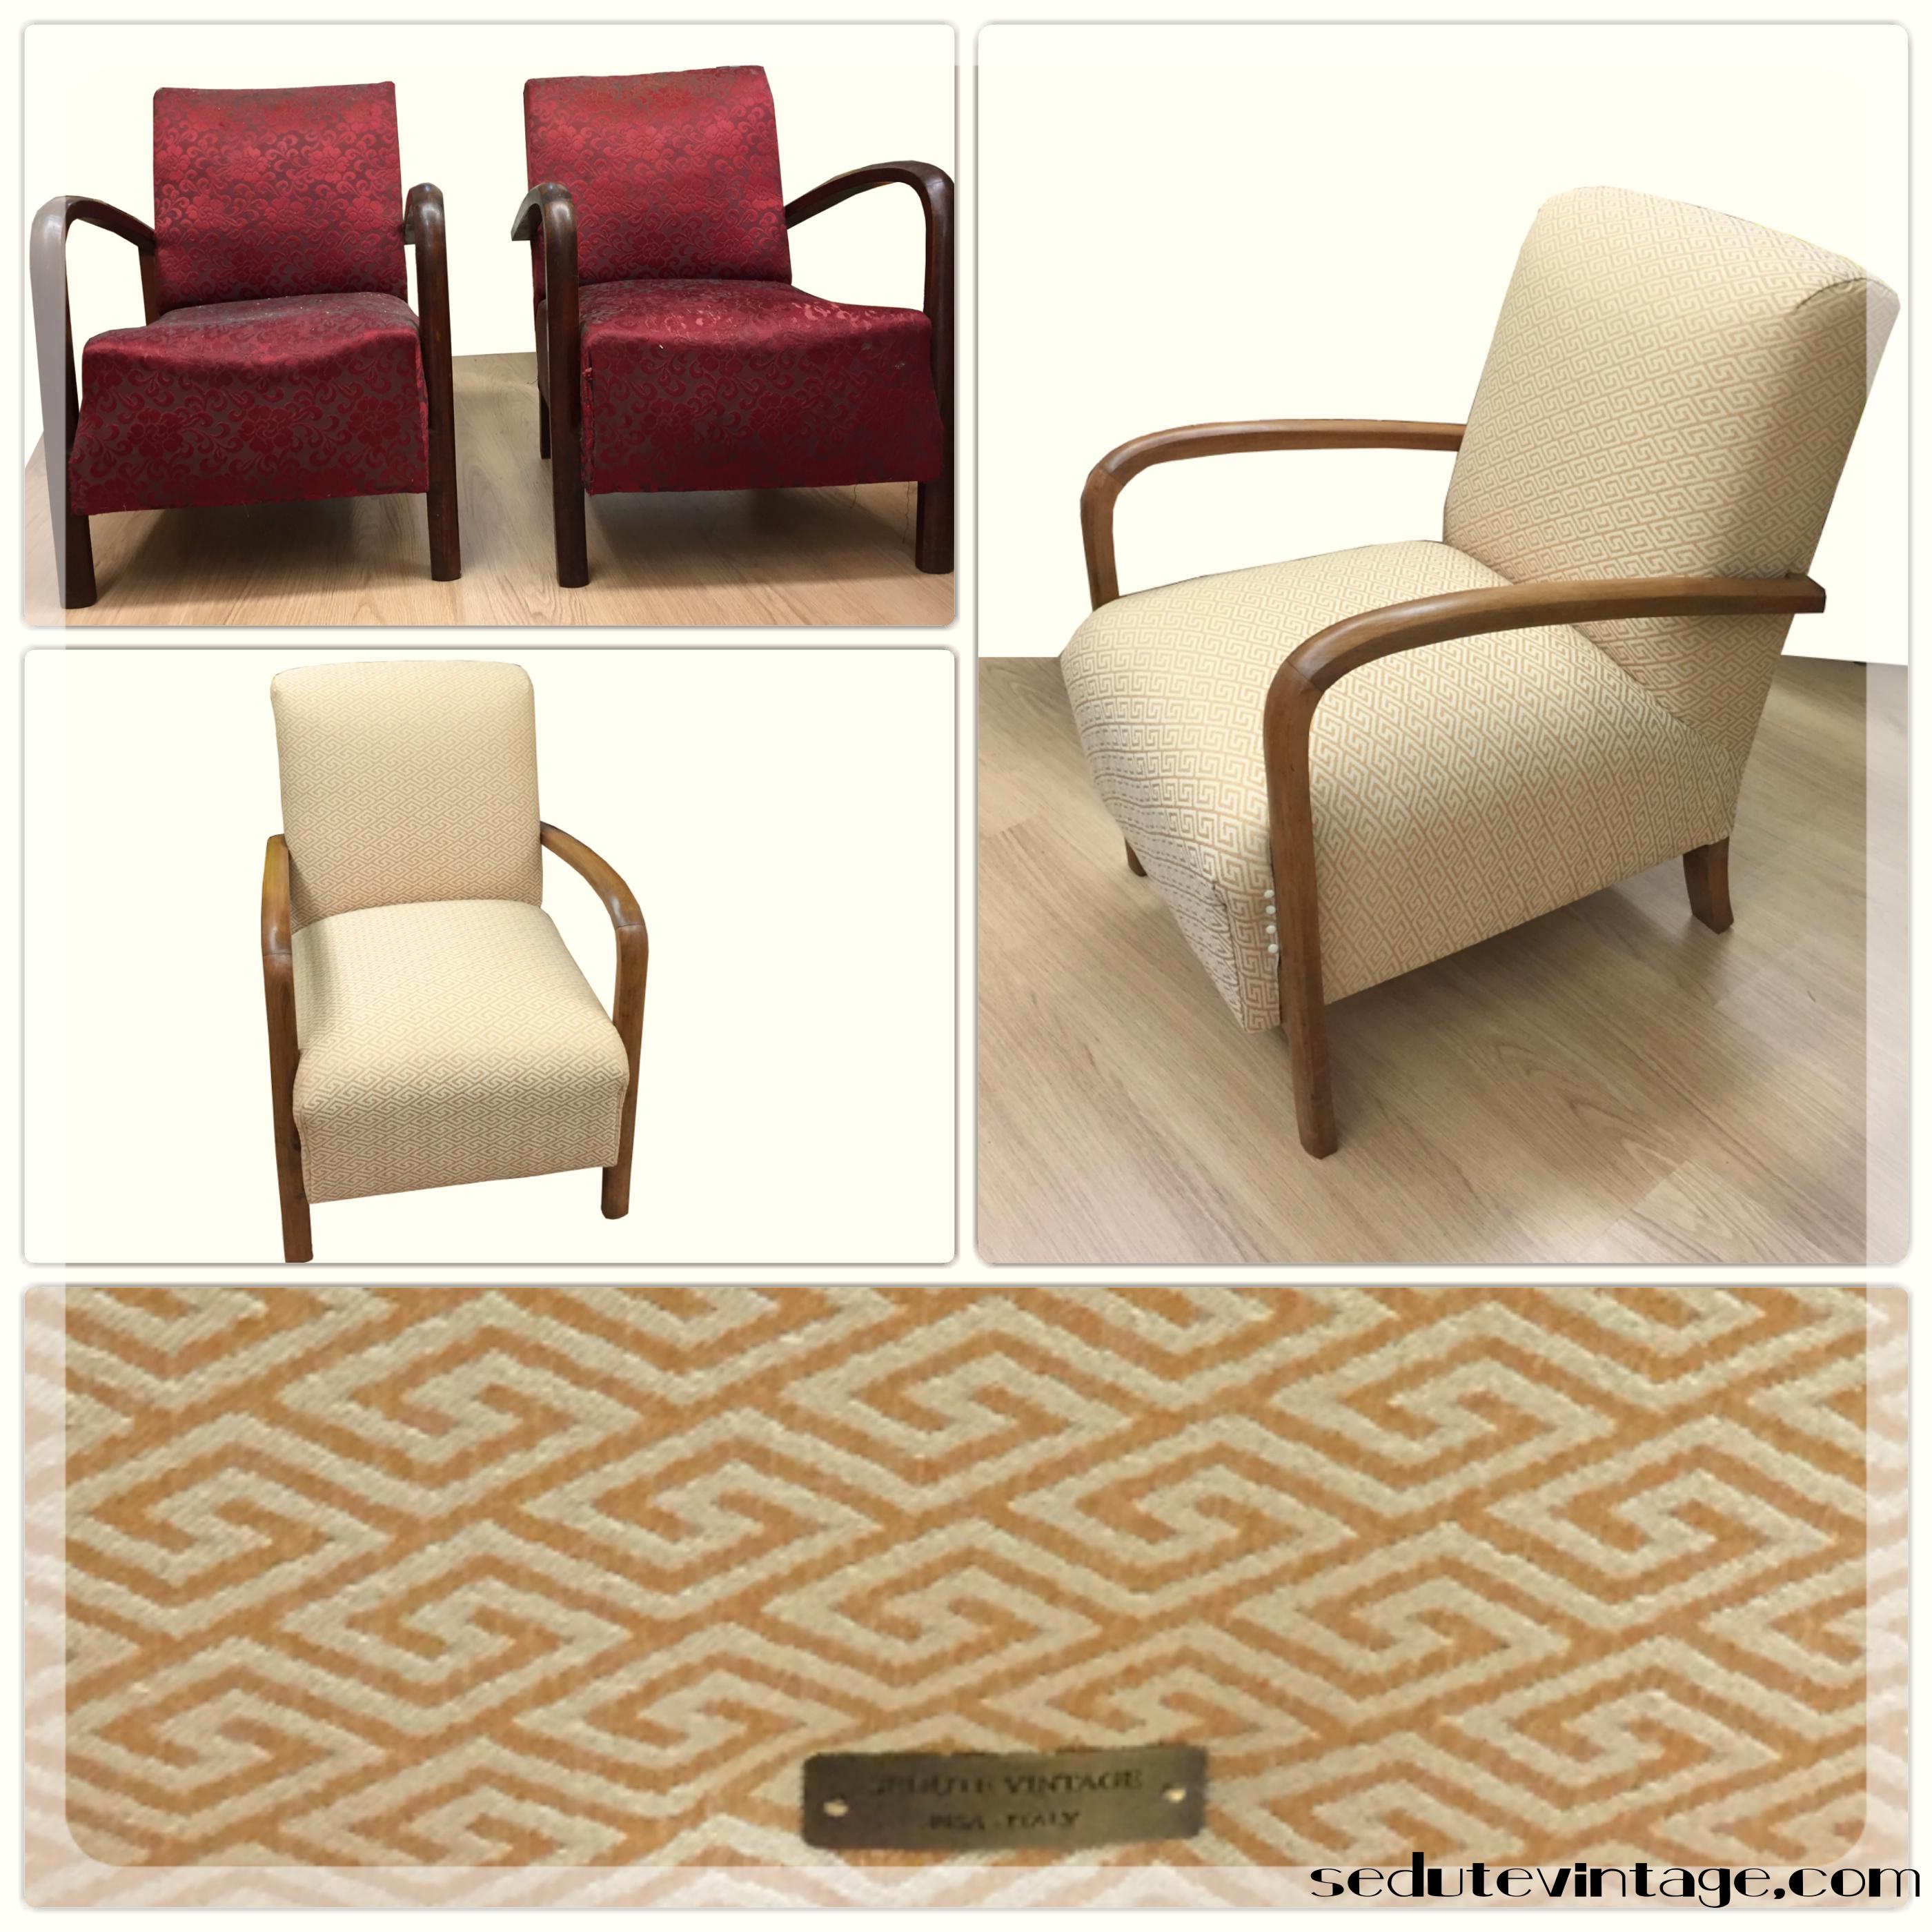 poltrone armchairs sedute vintage